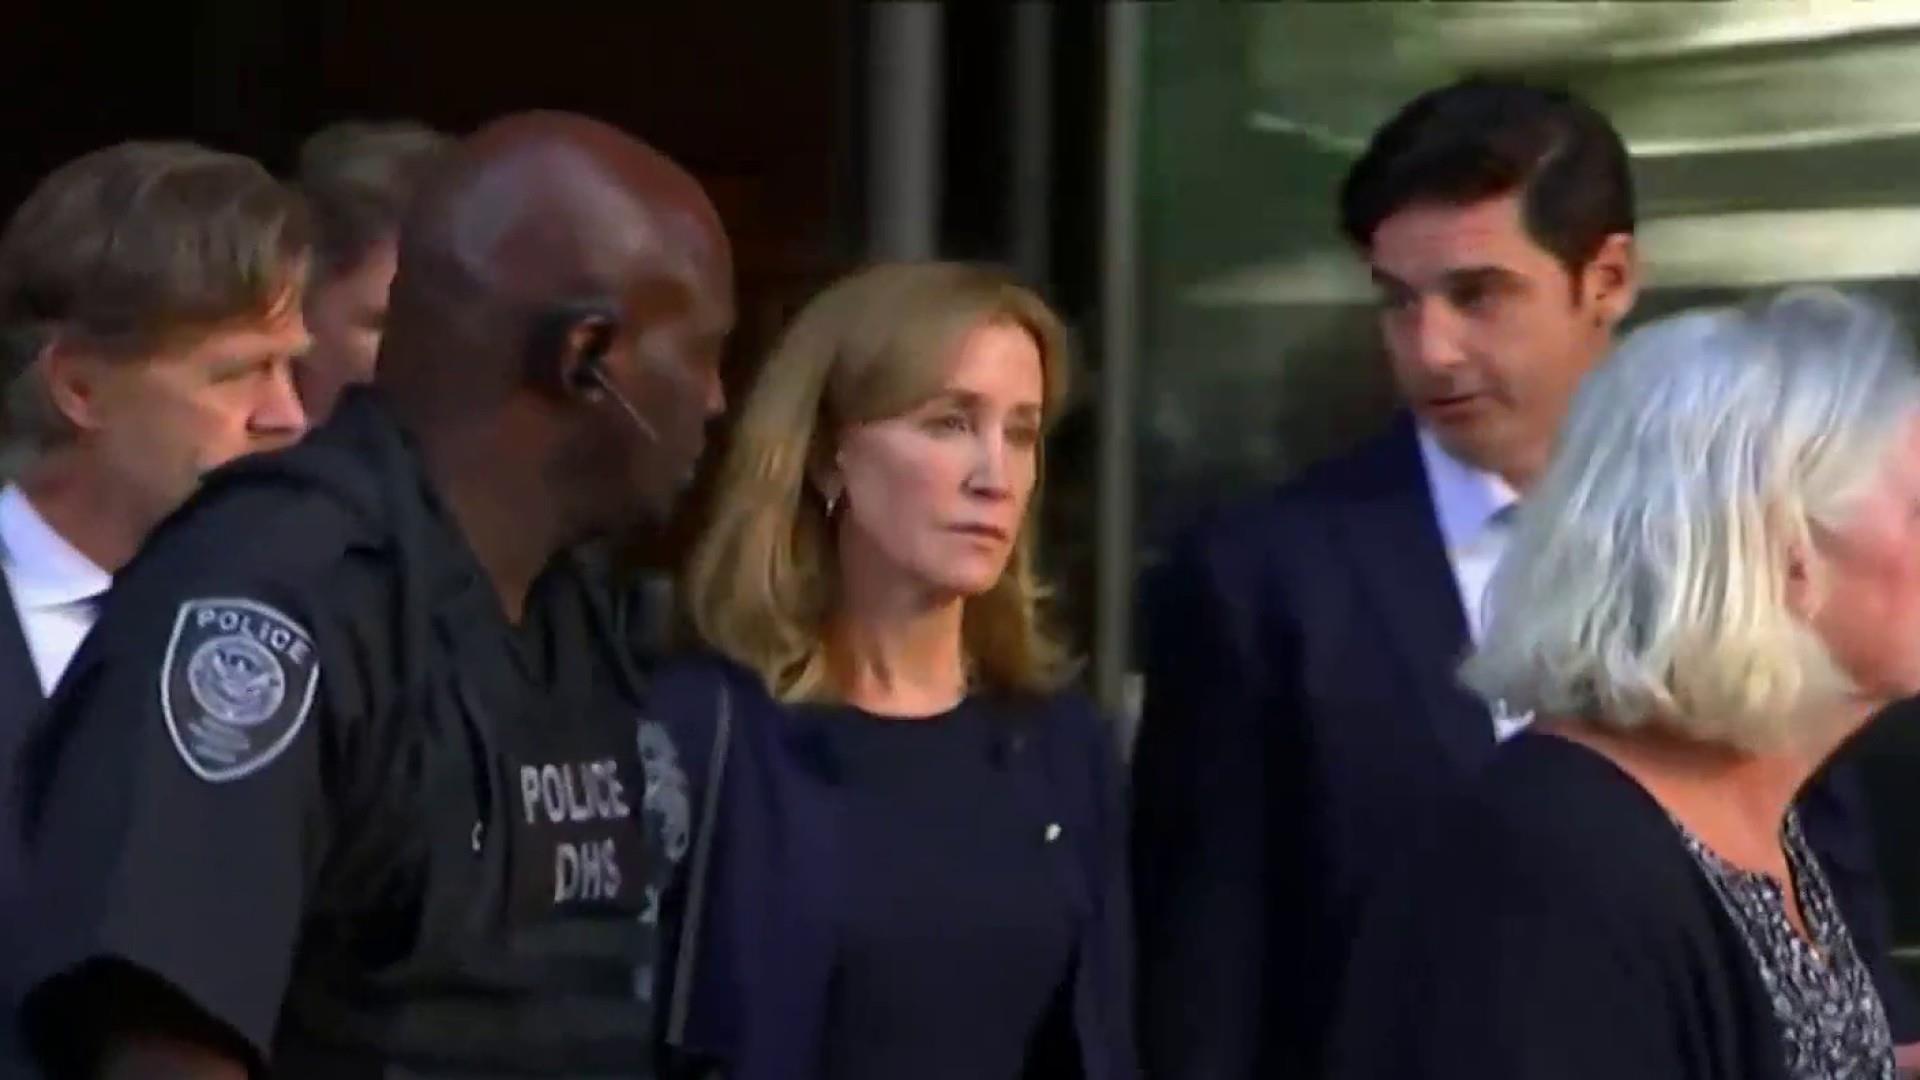 Prosecutor cites Ohio mom in plea for Felicity Huffman prison time